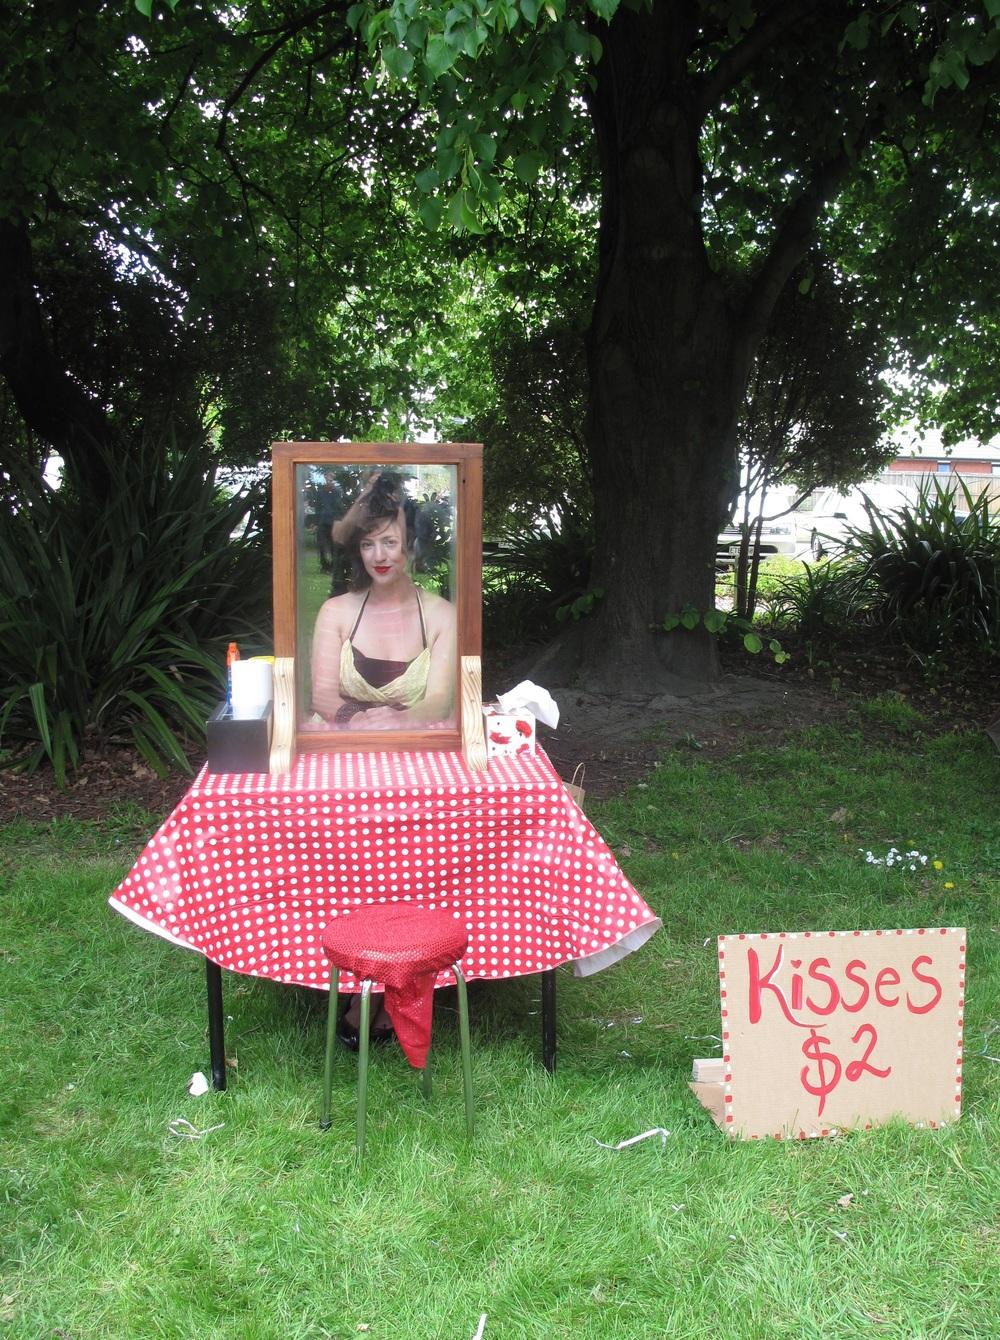 Kissing booth1.jpg